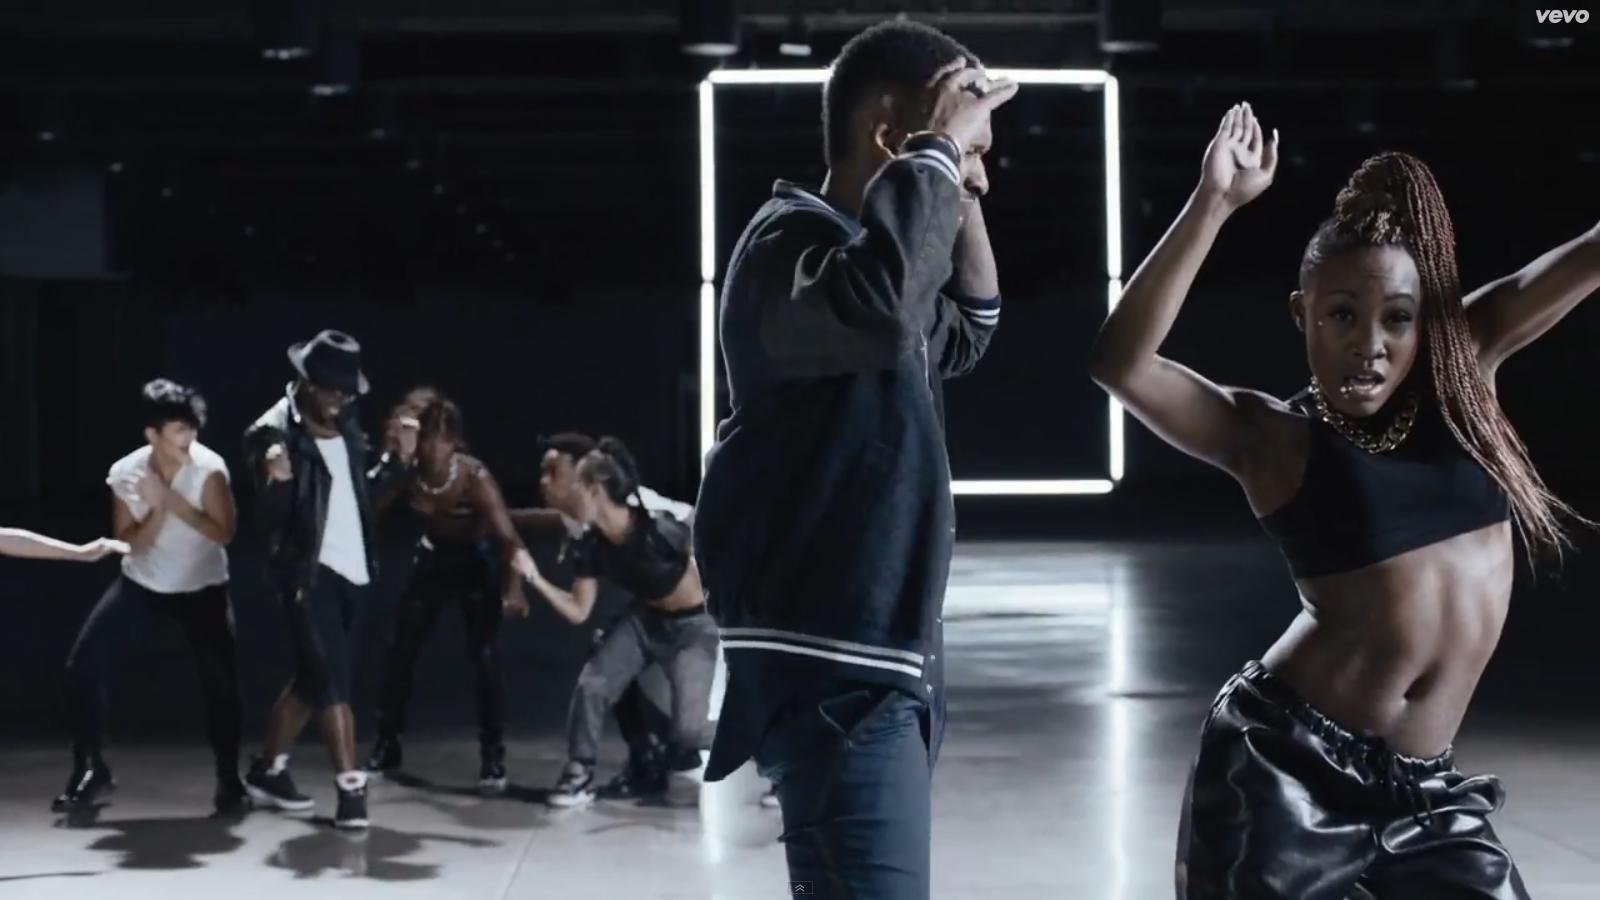 Usher and dancer